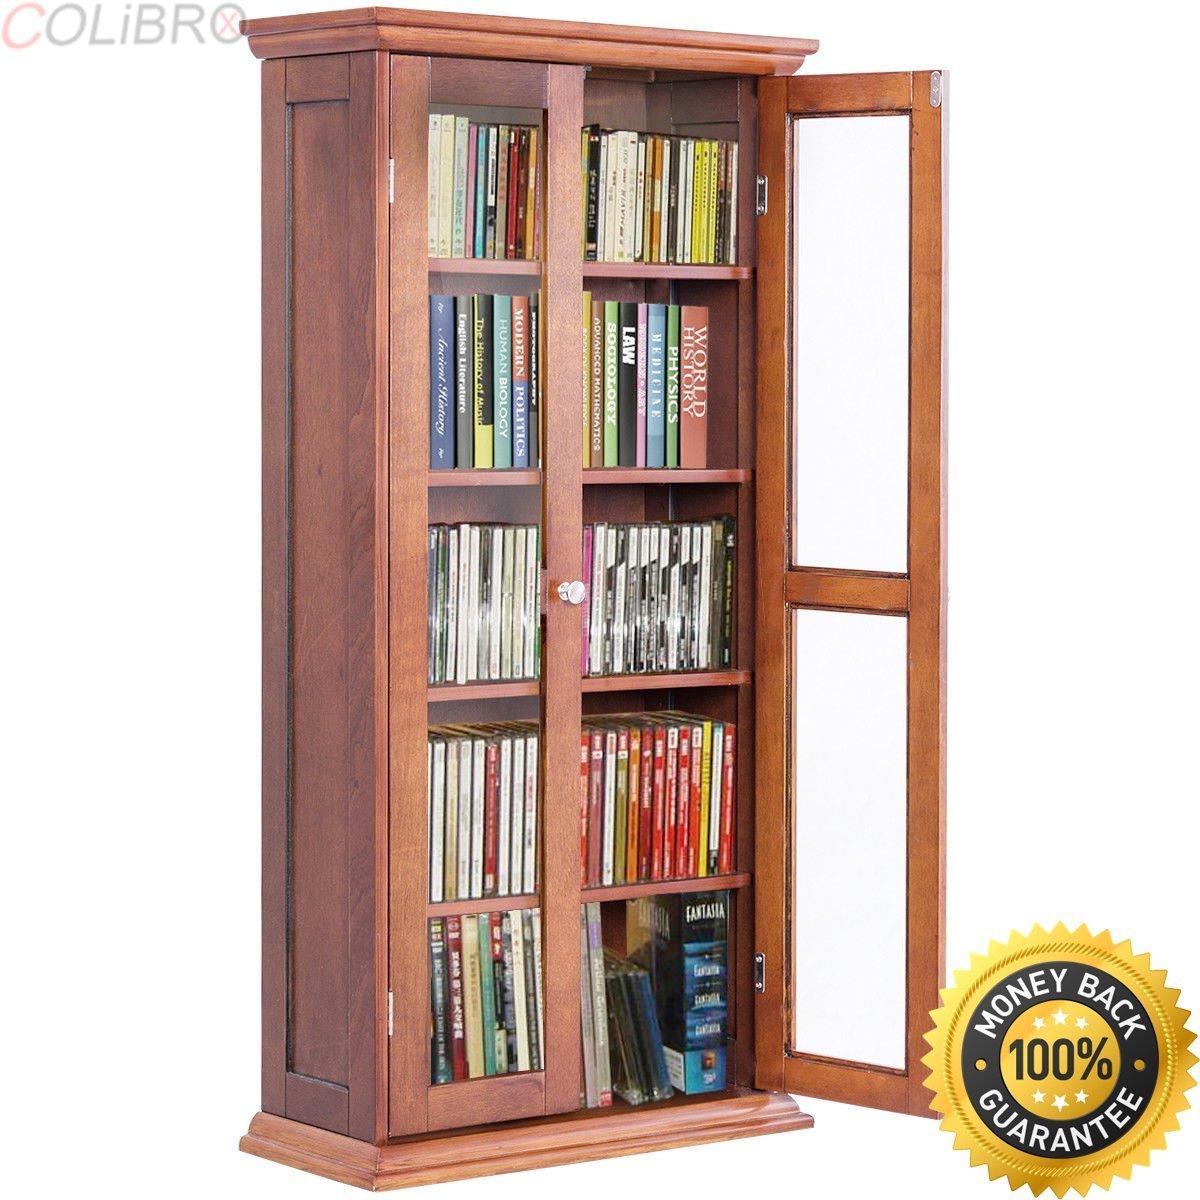 Get Quotations Colibrox 44 5 Wood Media Storage Cabinet Cd Dvd Shelves Tower Gl Doors Walnut